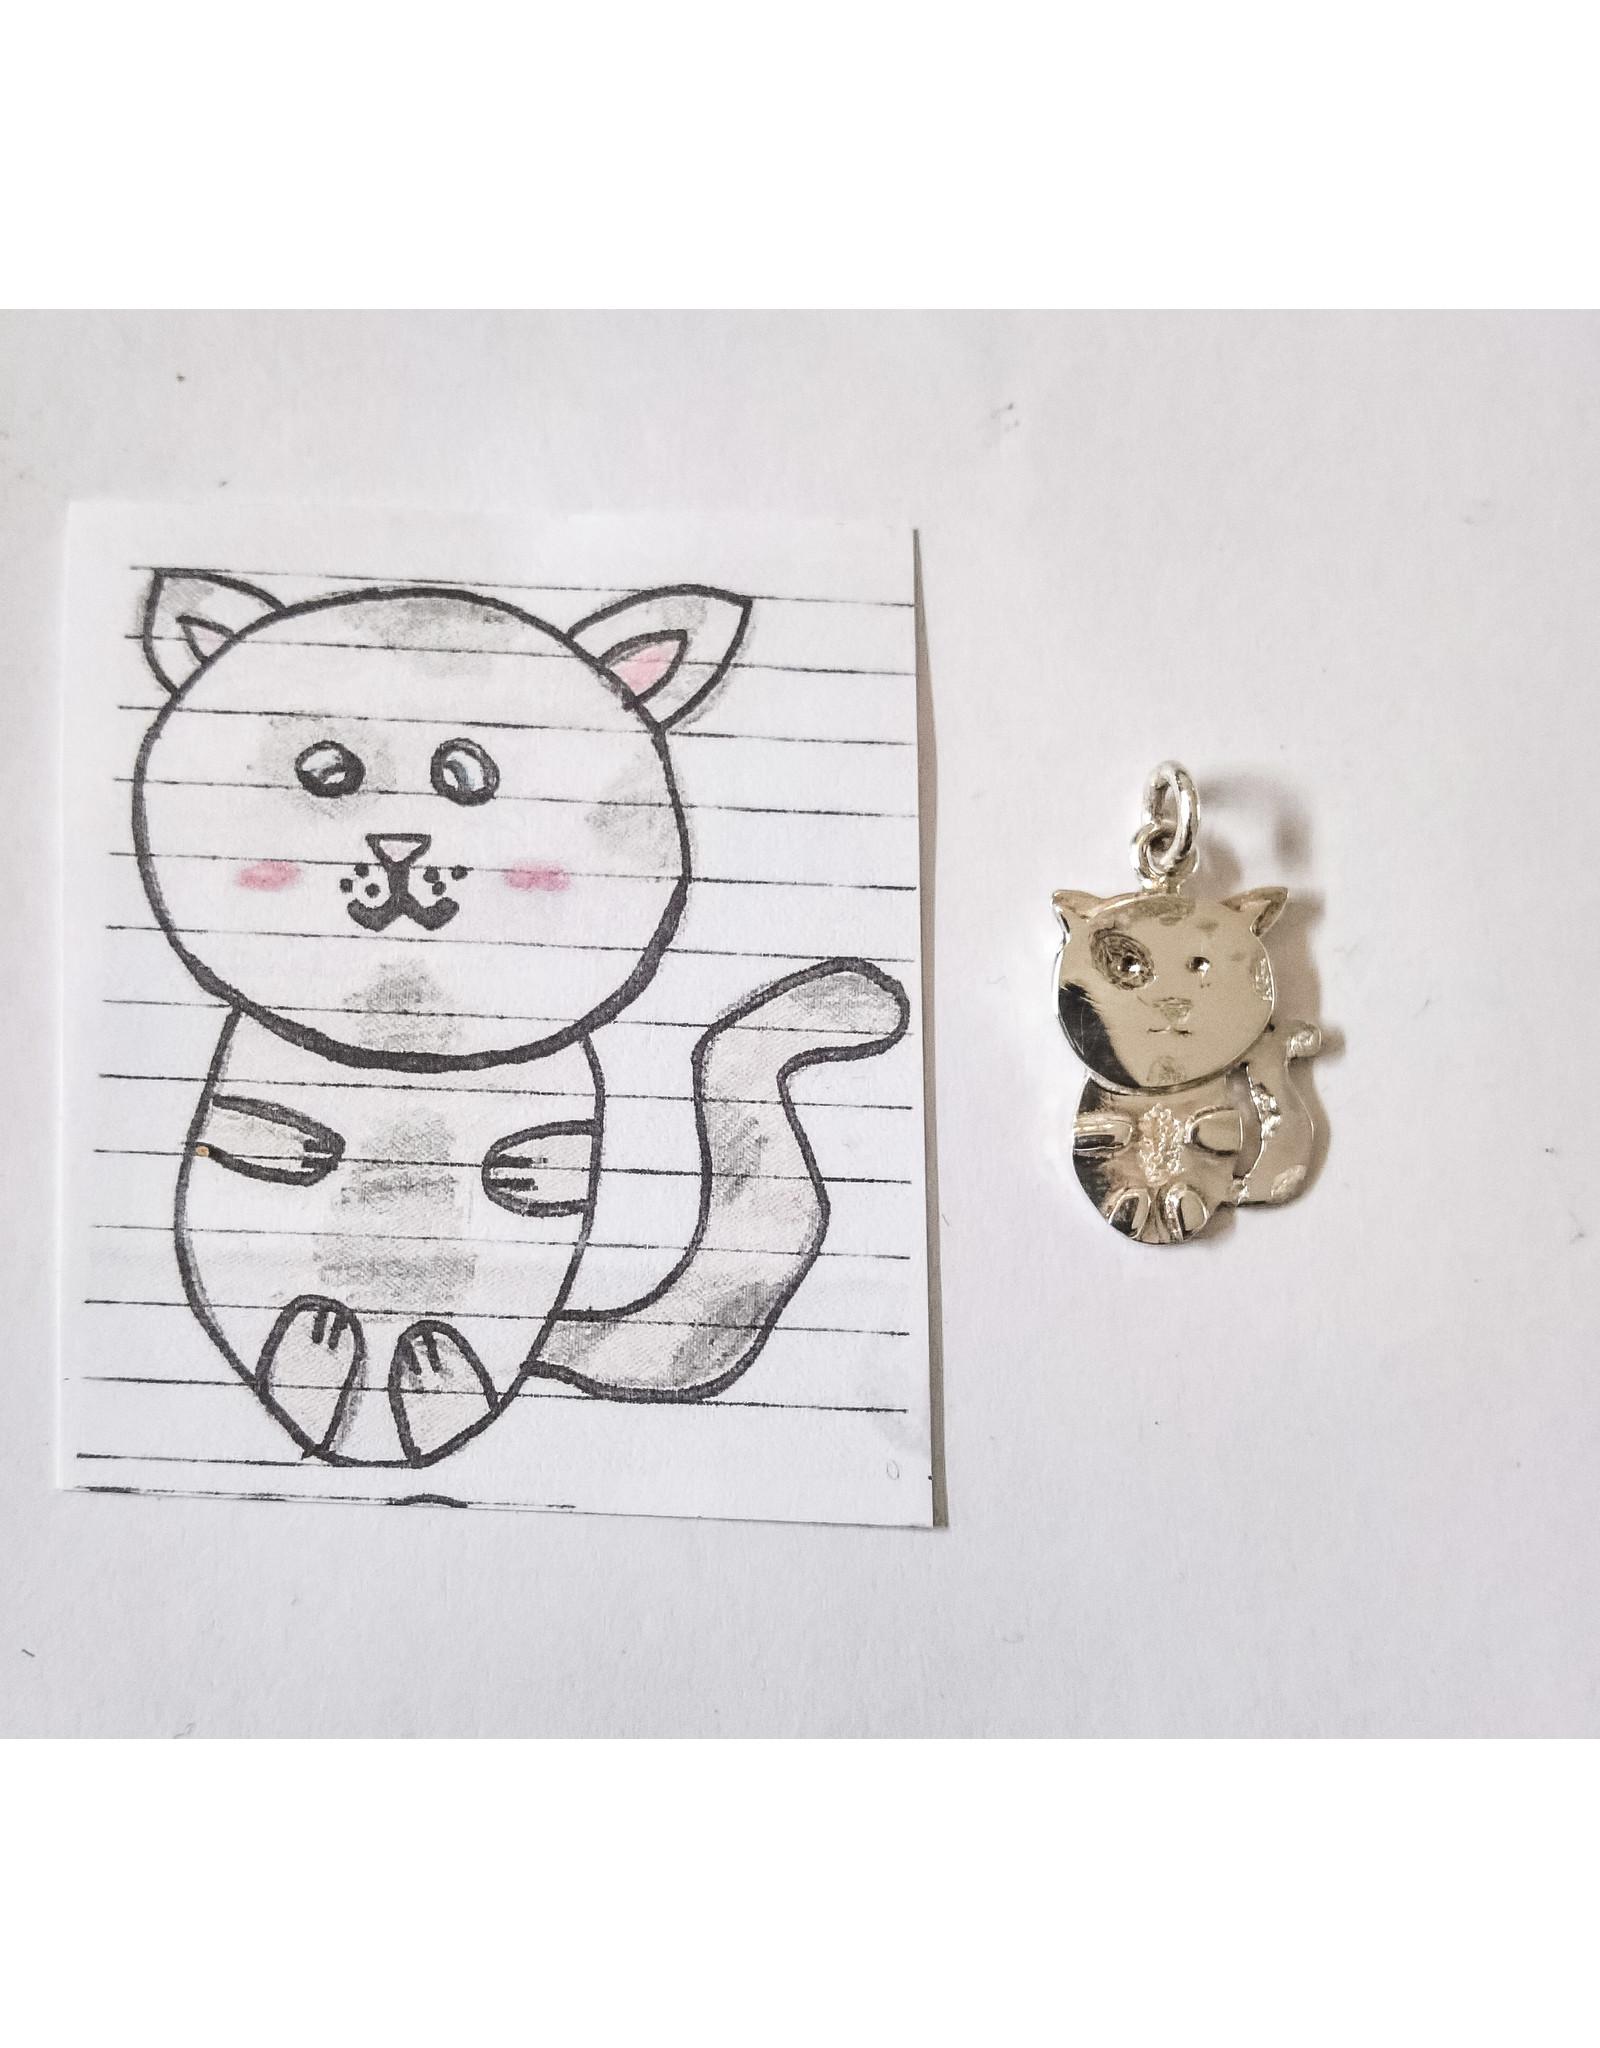 Handmade by Hanneke Weigel Een tekening als juweel